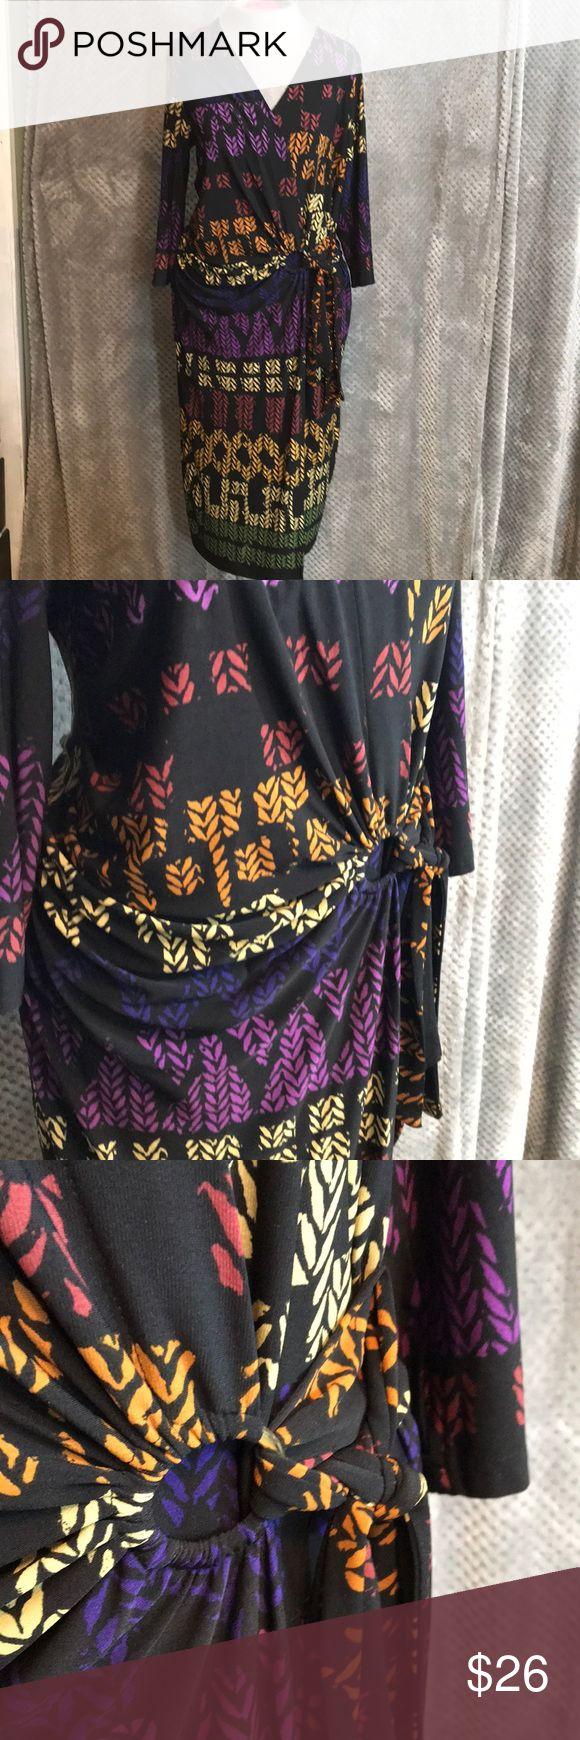 "Lennie for Nina Leonard geometric print wrap dress Great colorful wrap dress. Bust is approx 16"". Length 46"" lennie for nina leonard Dresses Midi"